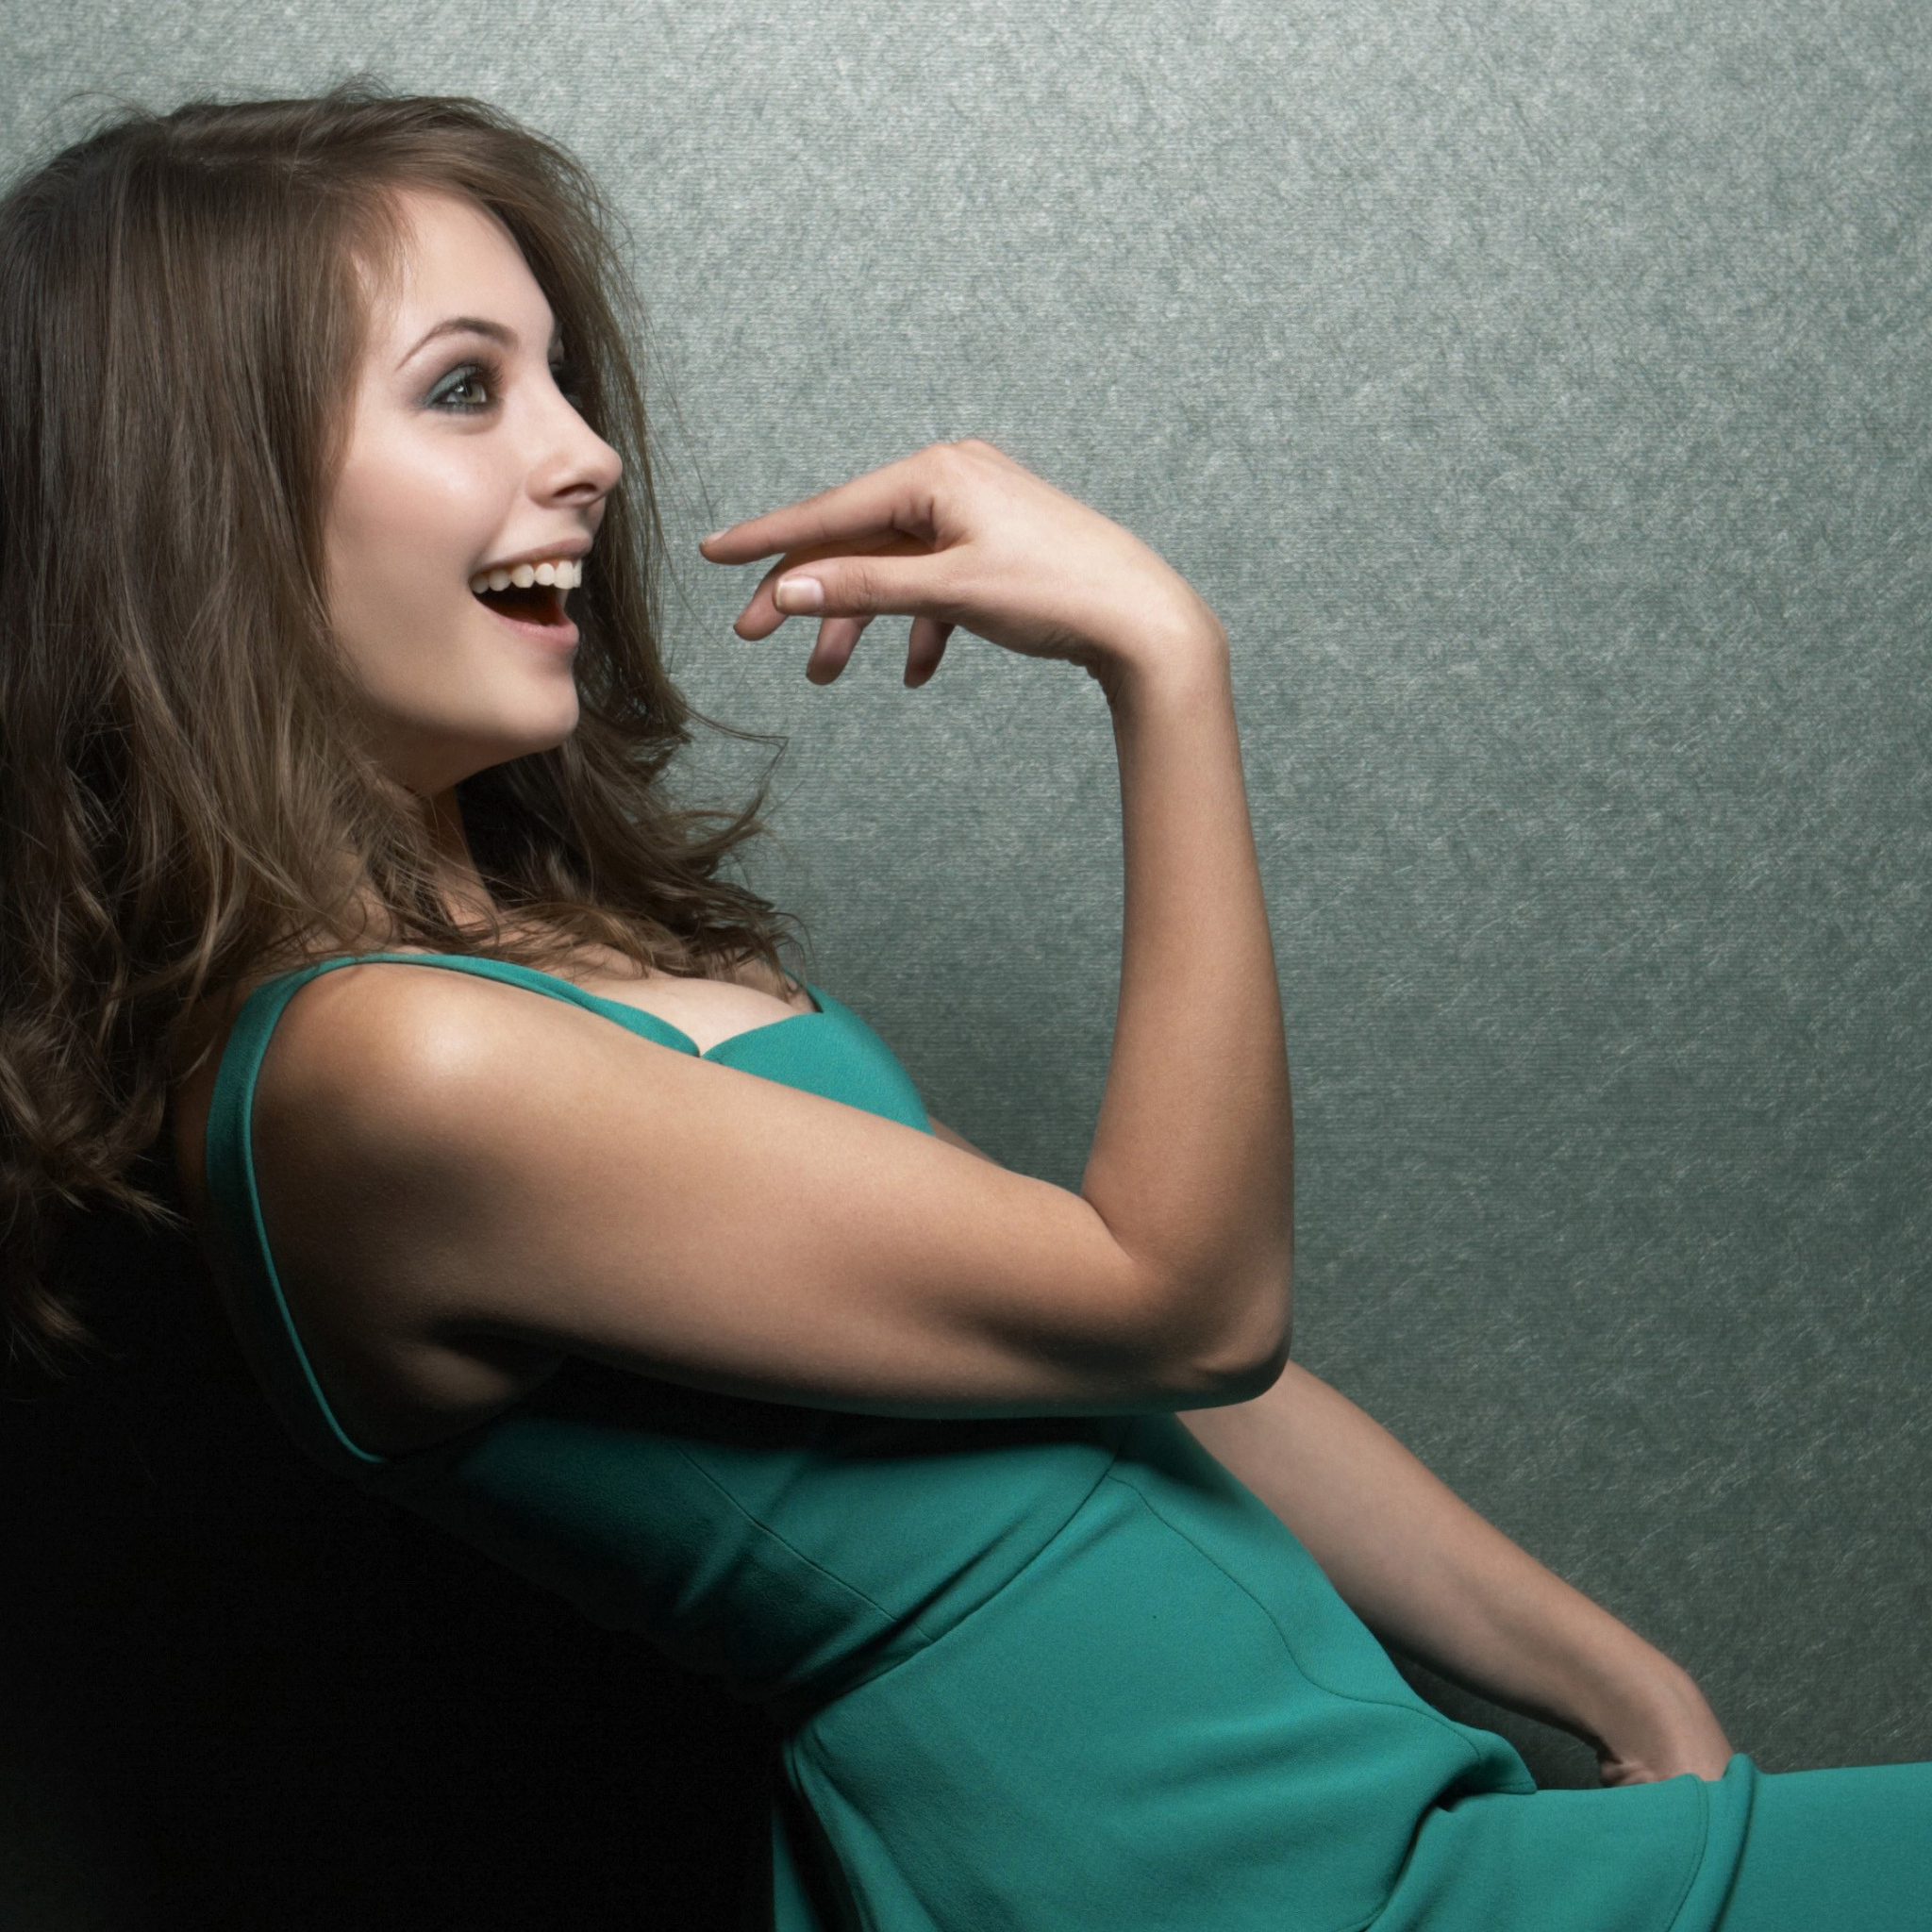 willa-holland-cute-smiling-4k-p9.jpg